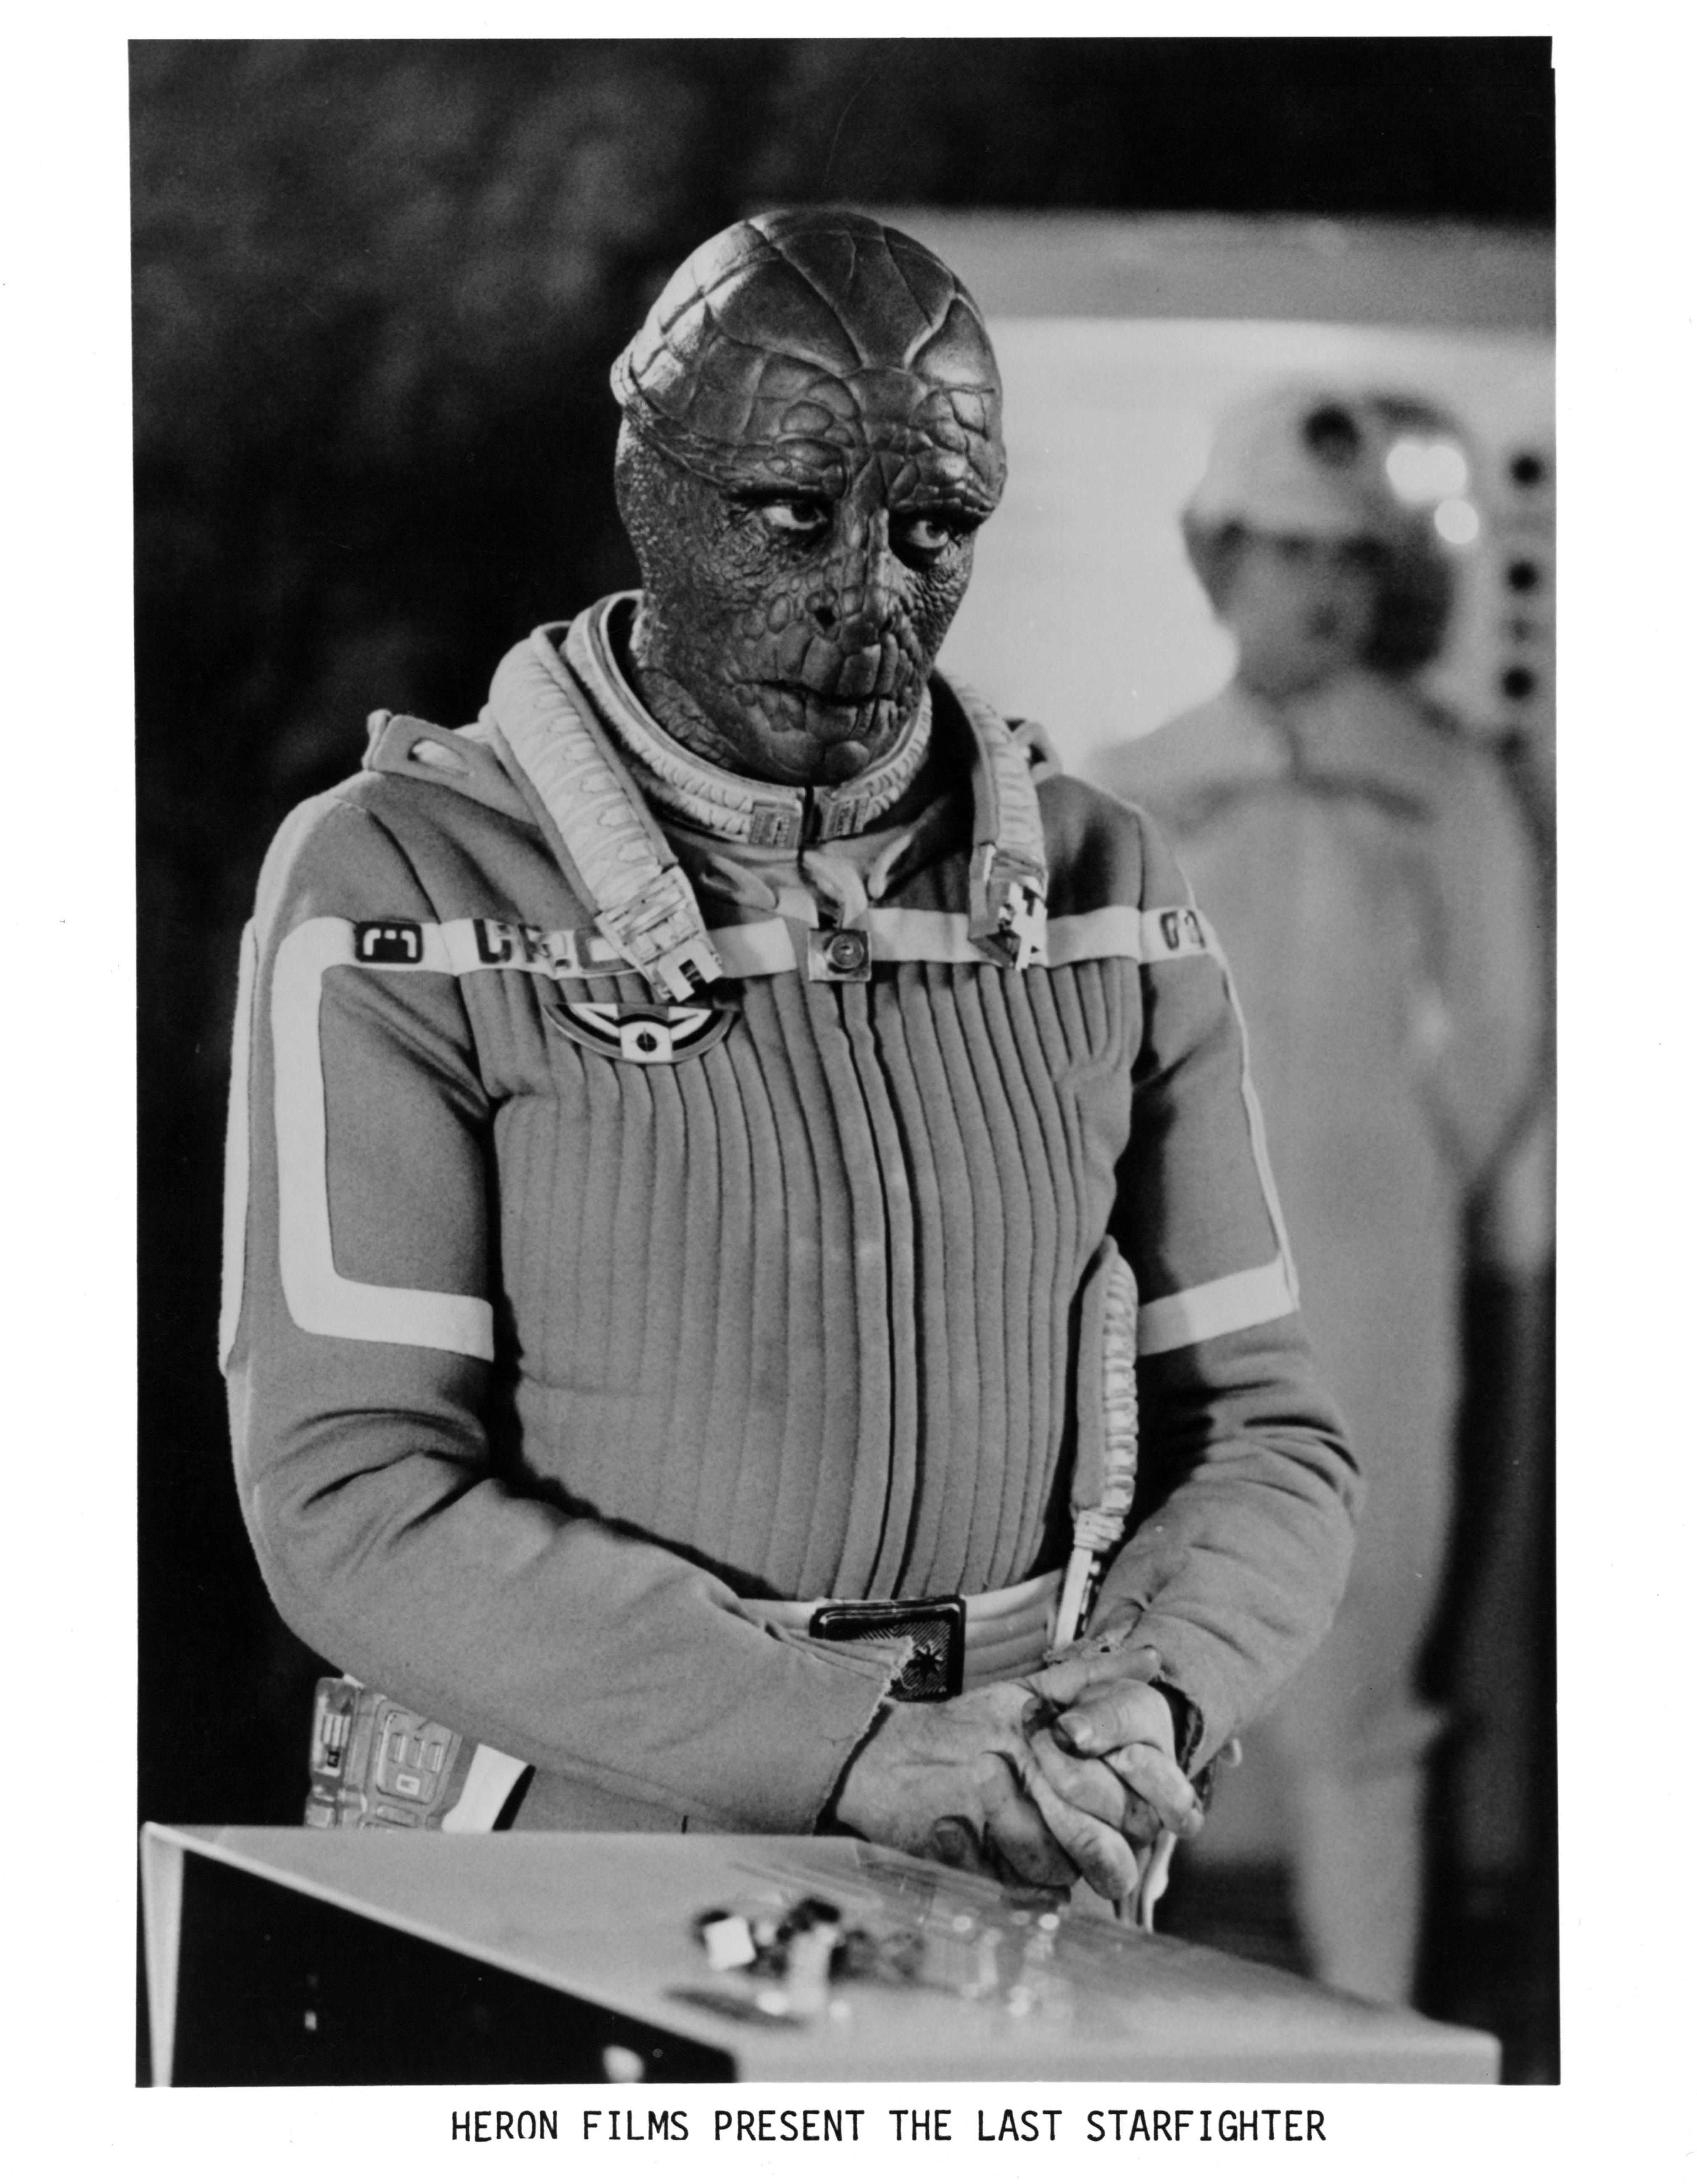 Dan O'Herlihy in The Last Starfighter (1984)